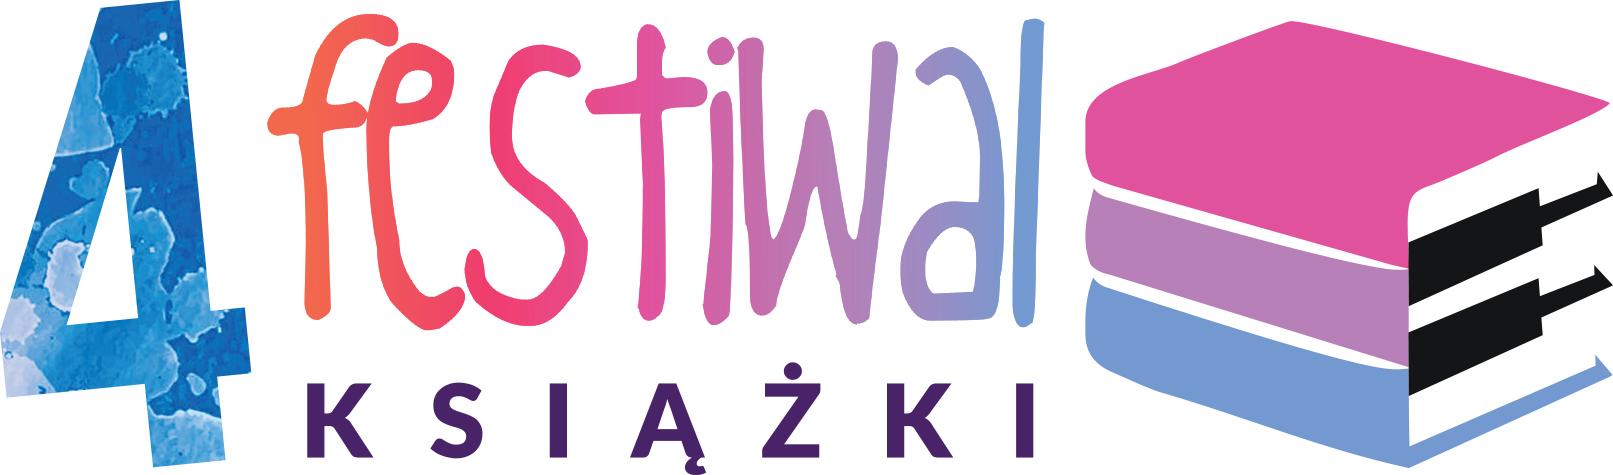 FESTIWAL KSIĄŻKI 2019 w MBP